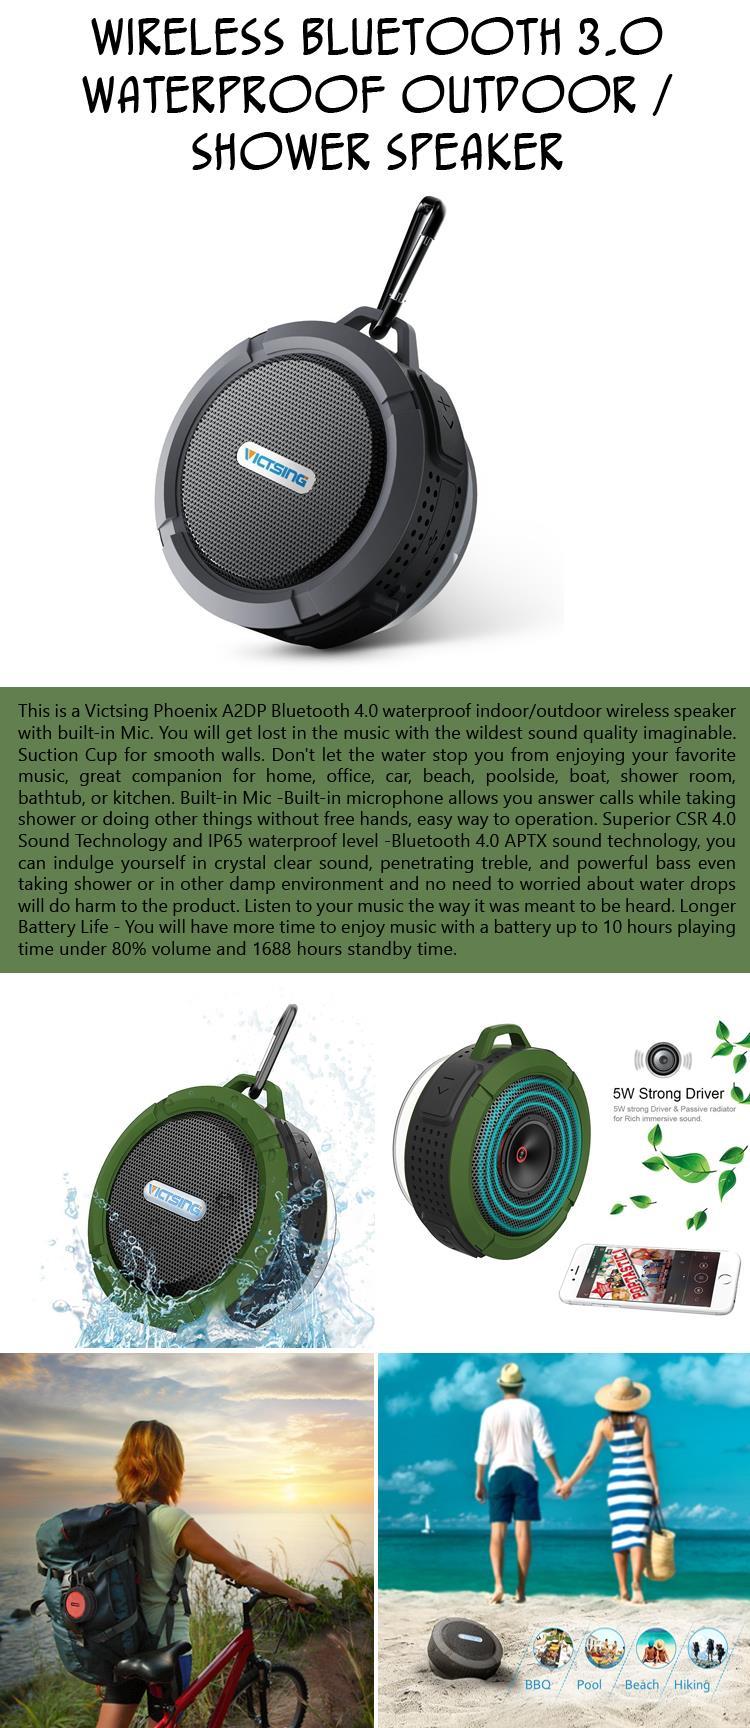 Wireless Bluetooth Waterproof Outdoor  Shower Speaker